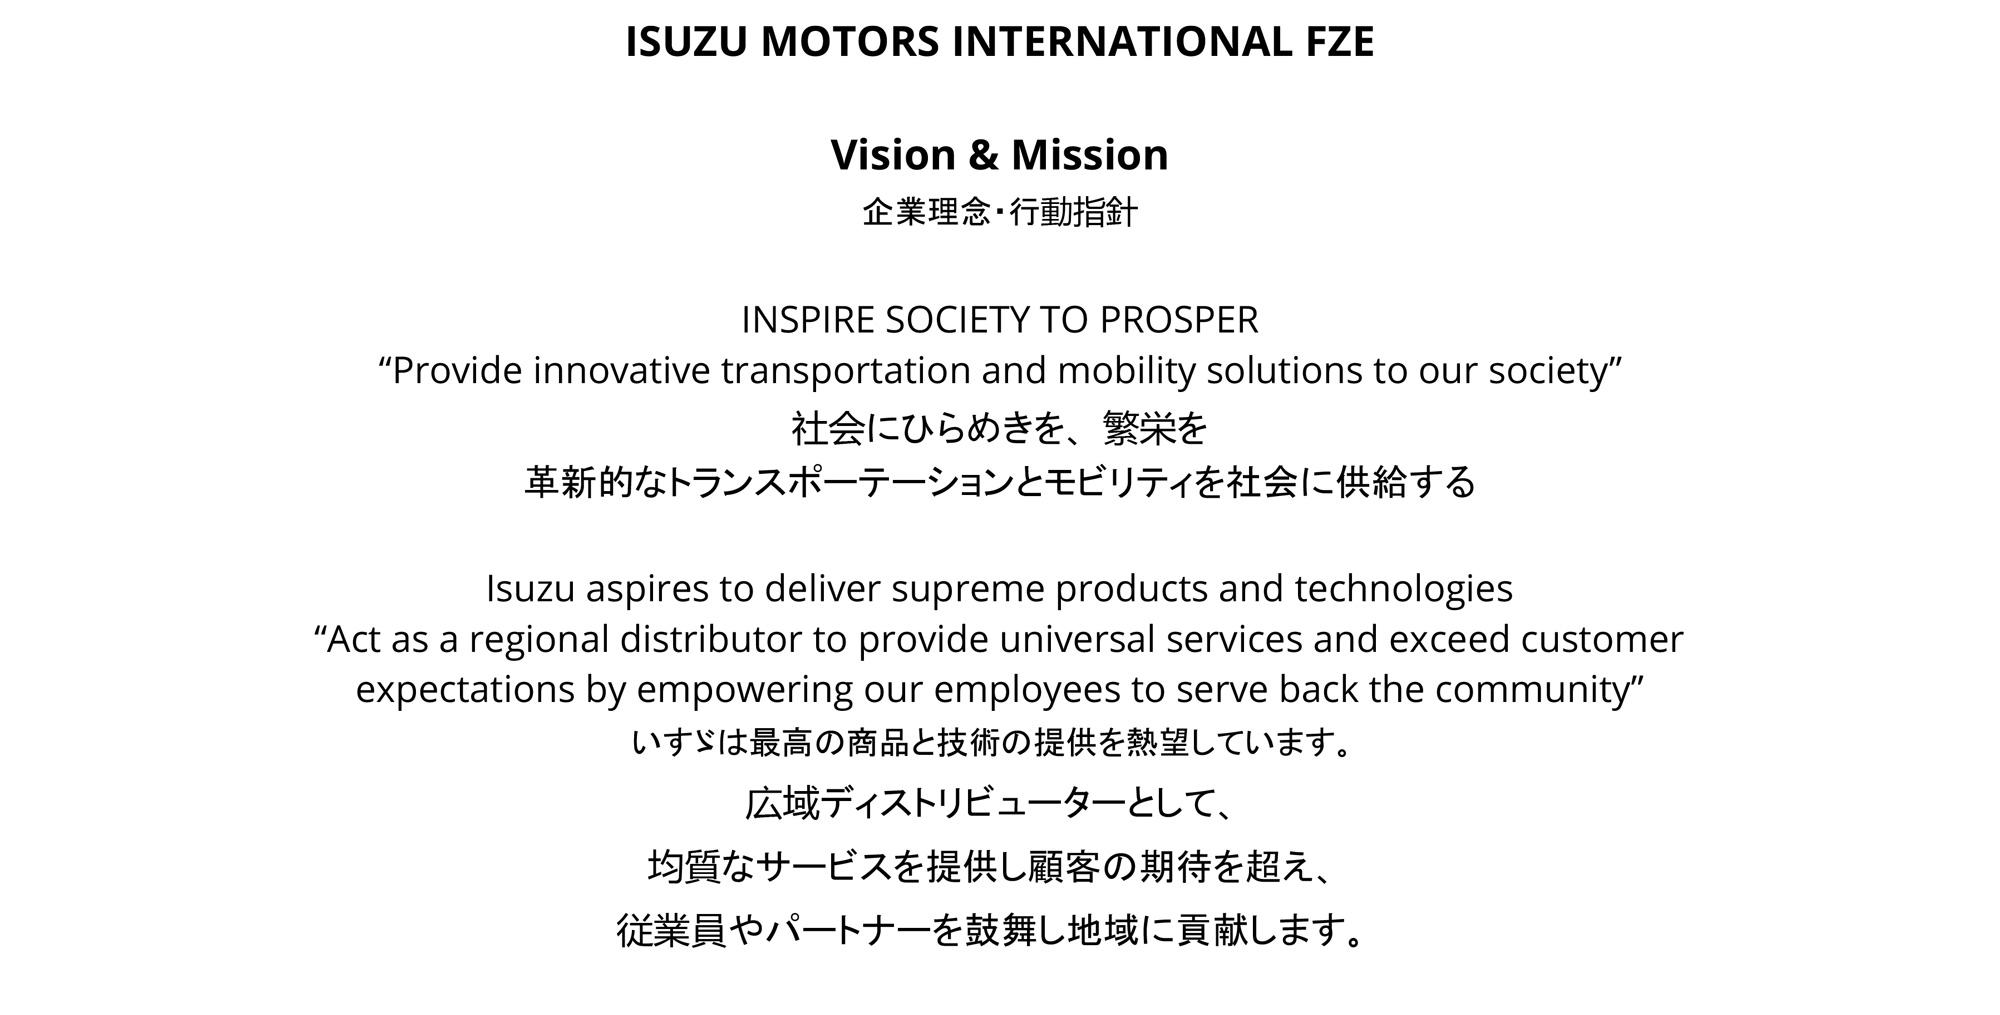 Isuzu Motors International vision and mission